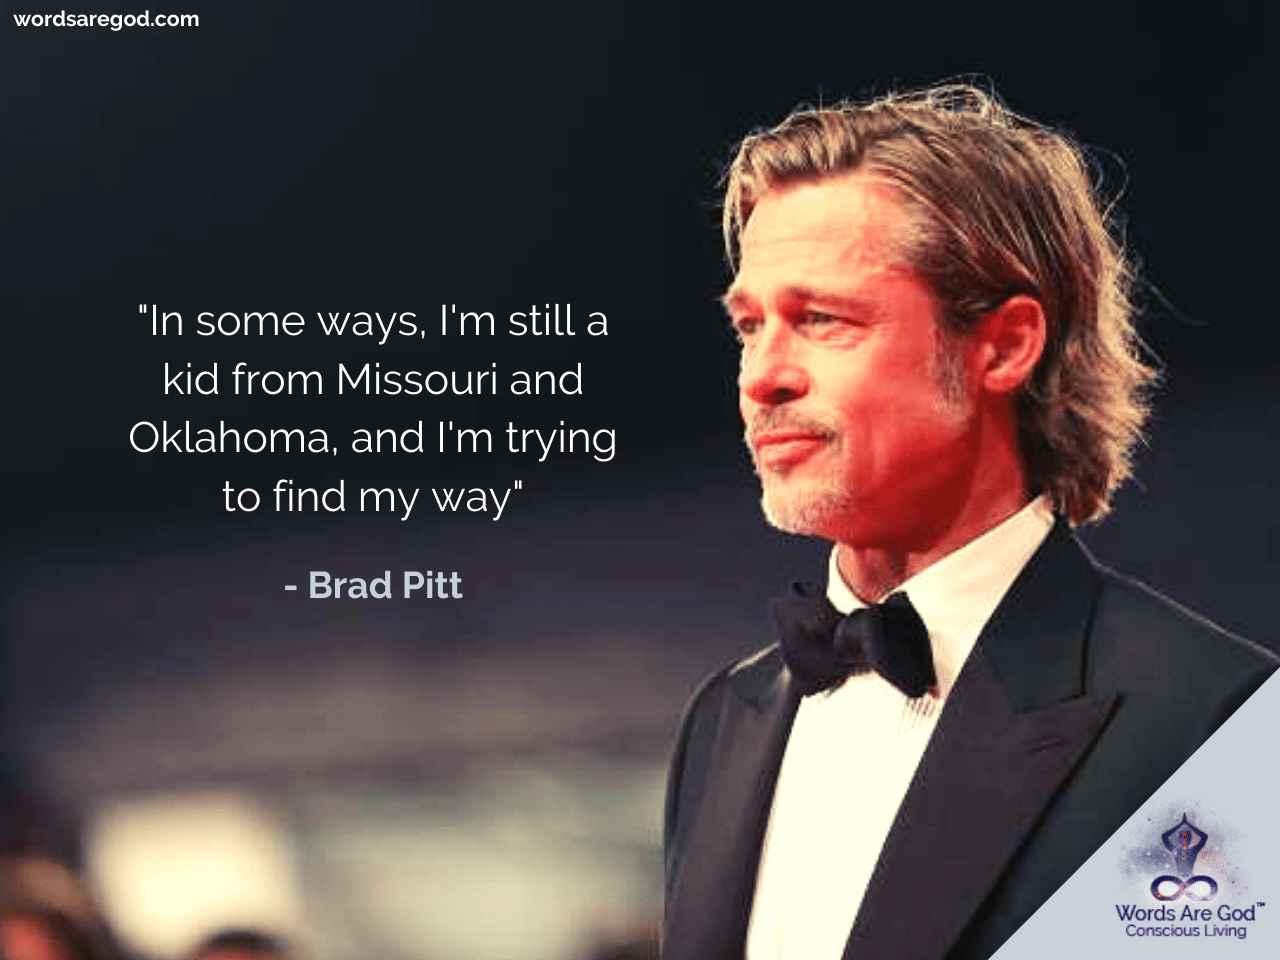 Brad Pitt Quotes by Brad Pitt